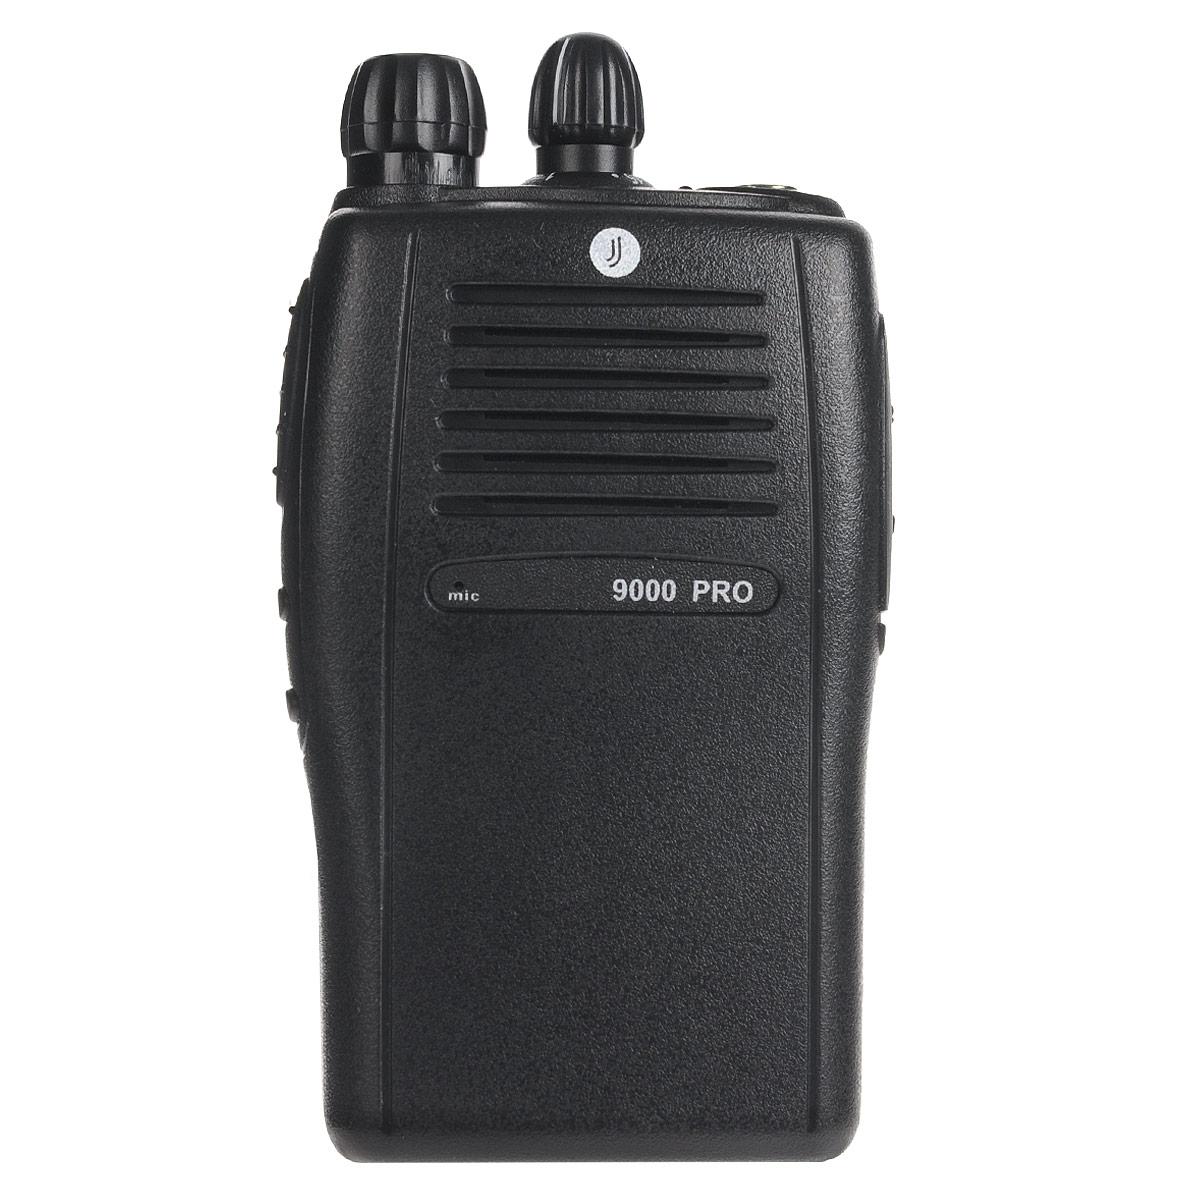 Радиостанция JJConnect 5001 PRO